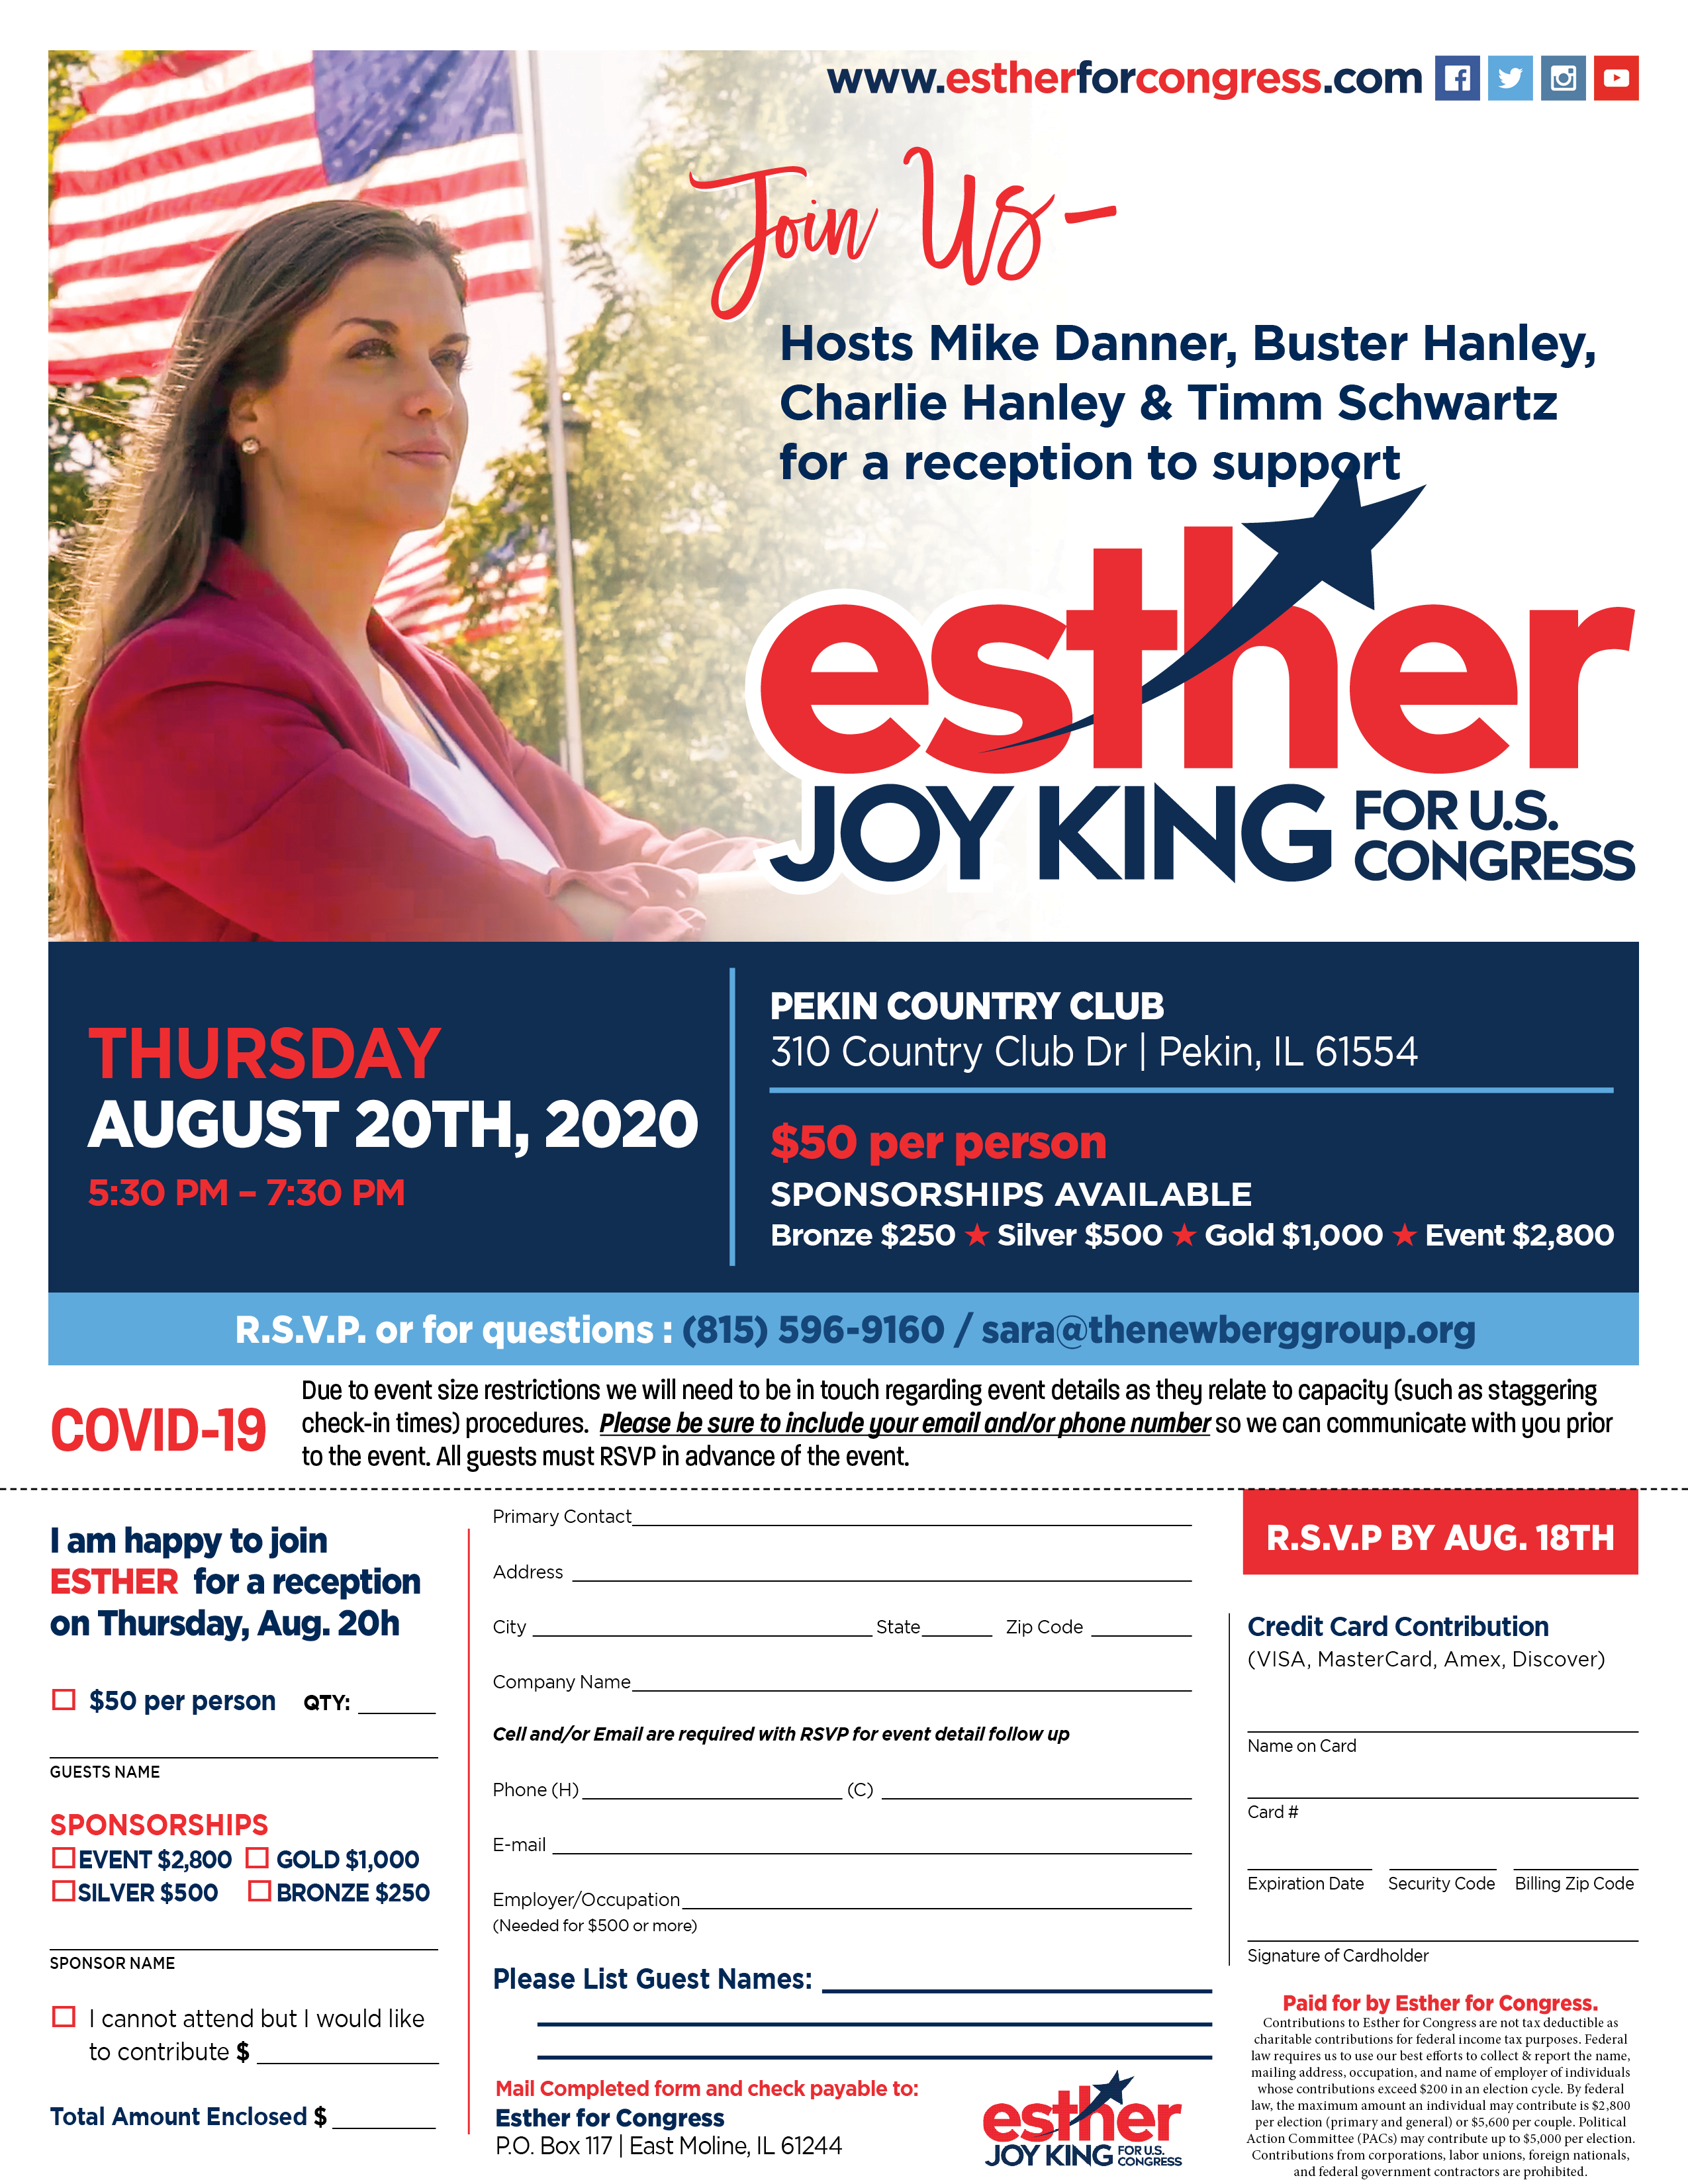 Esther Joy King Reception